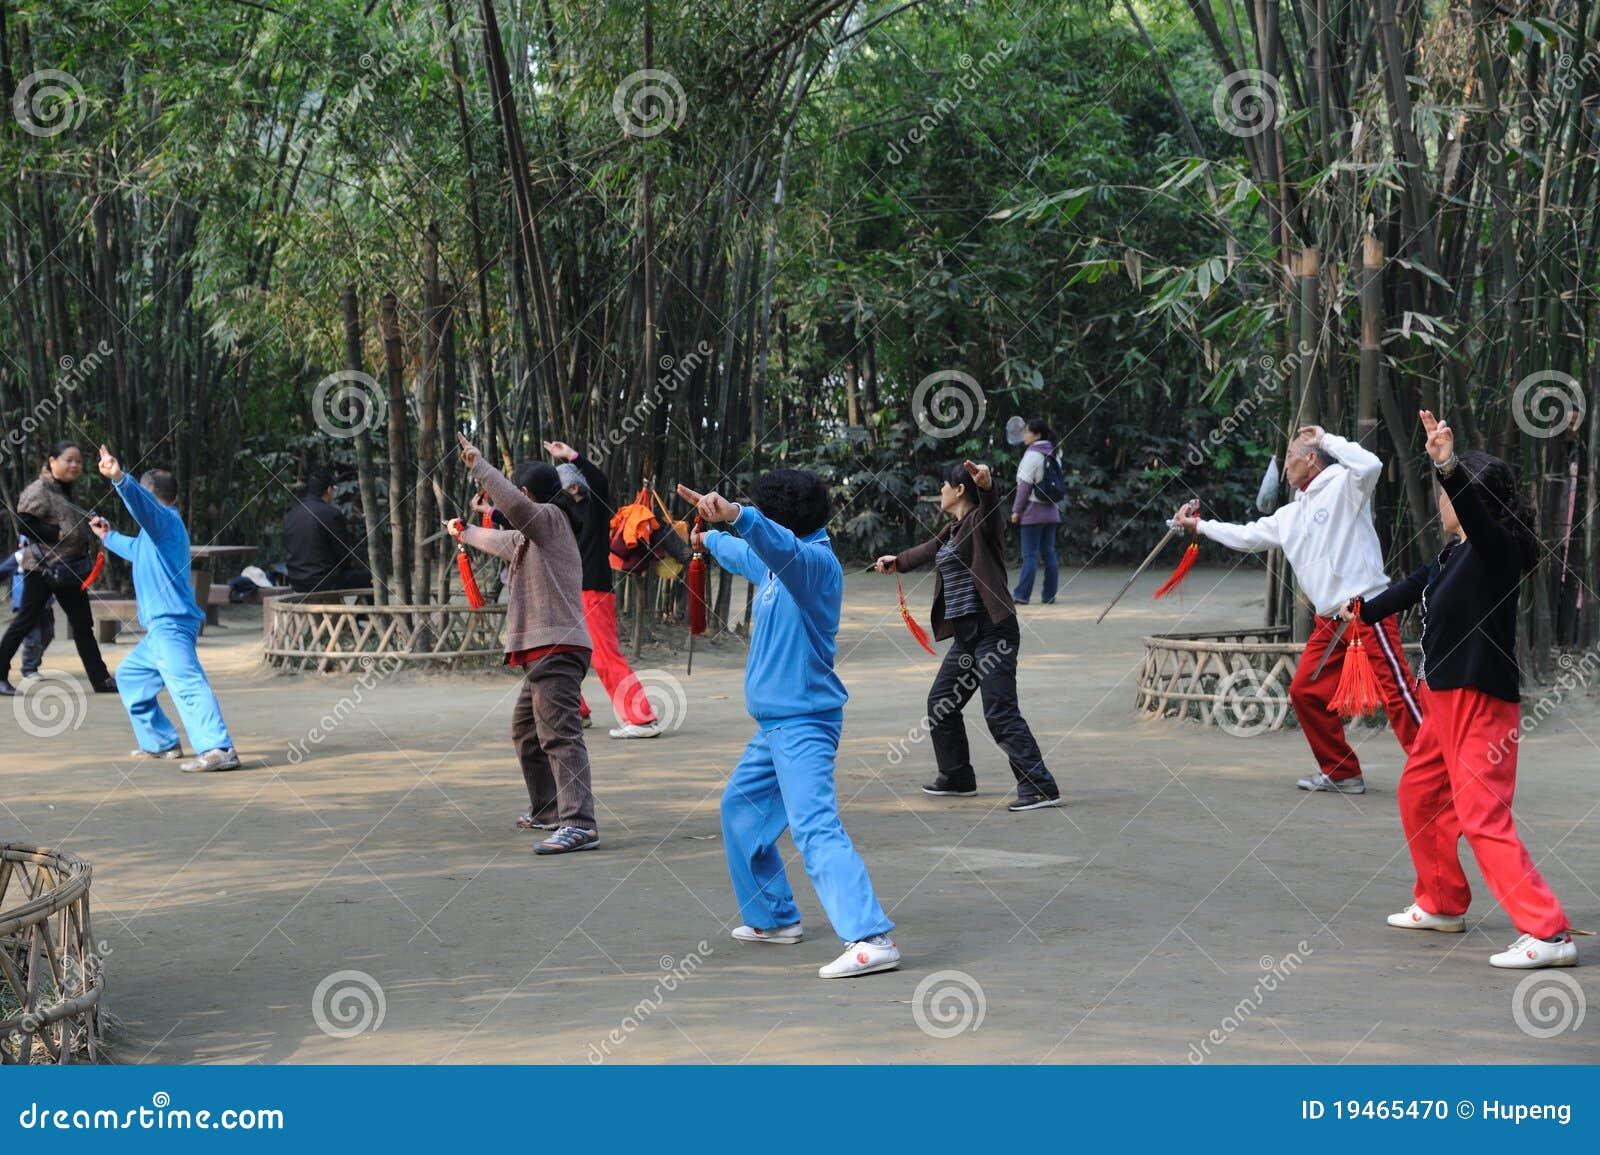 Chinese people are playing taiji sword